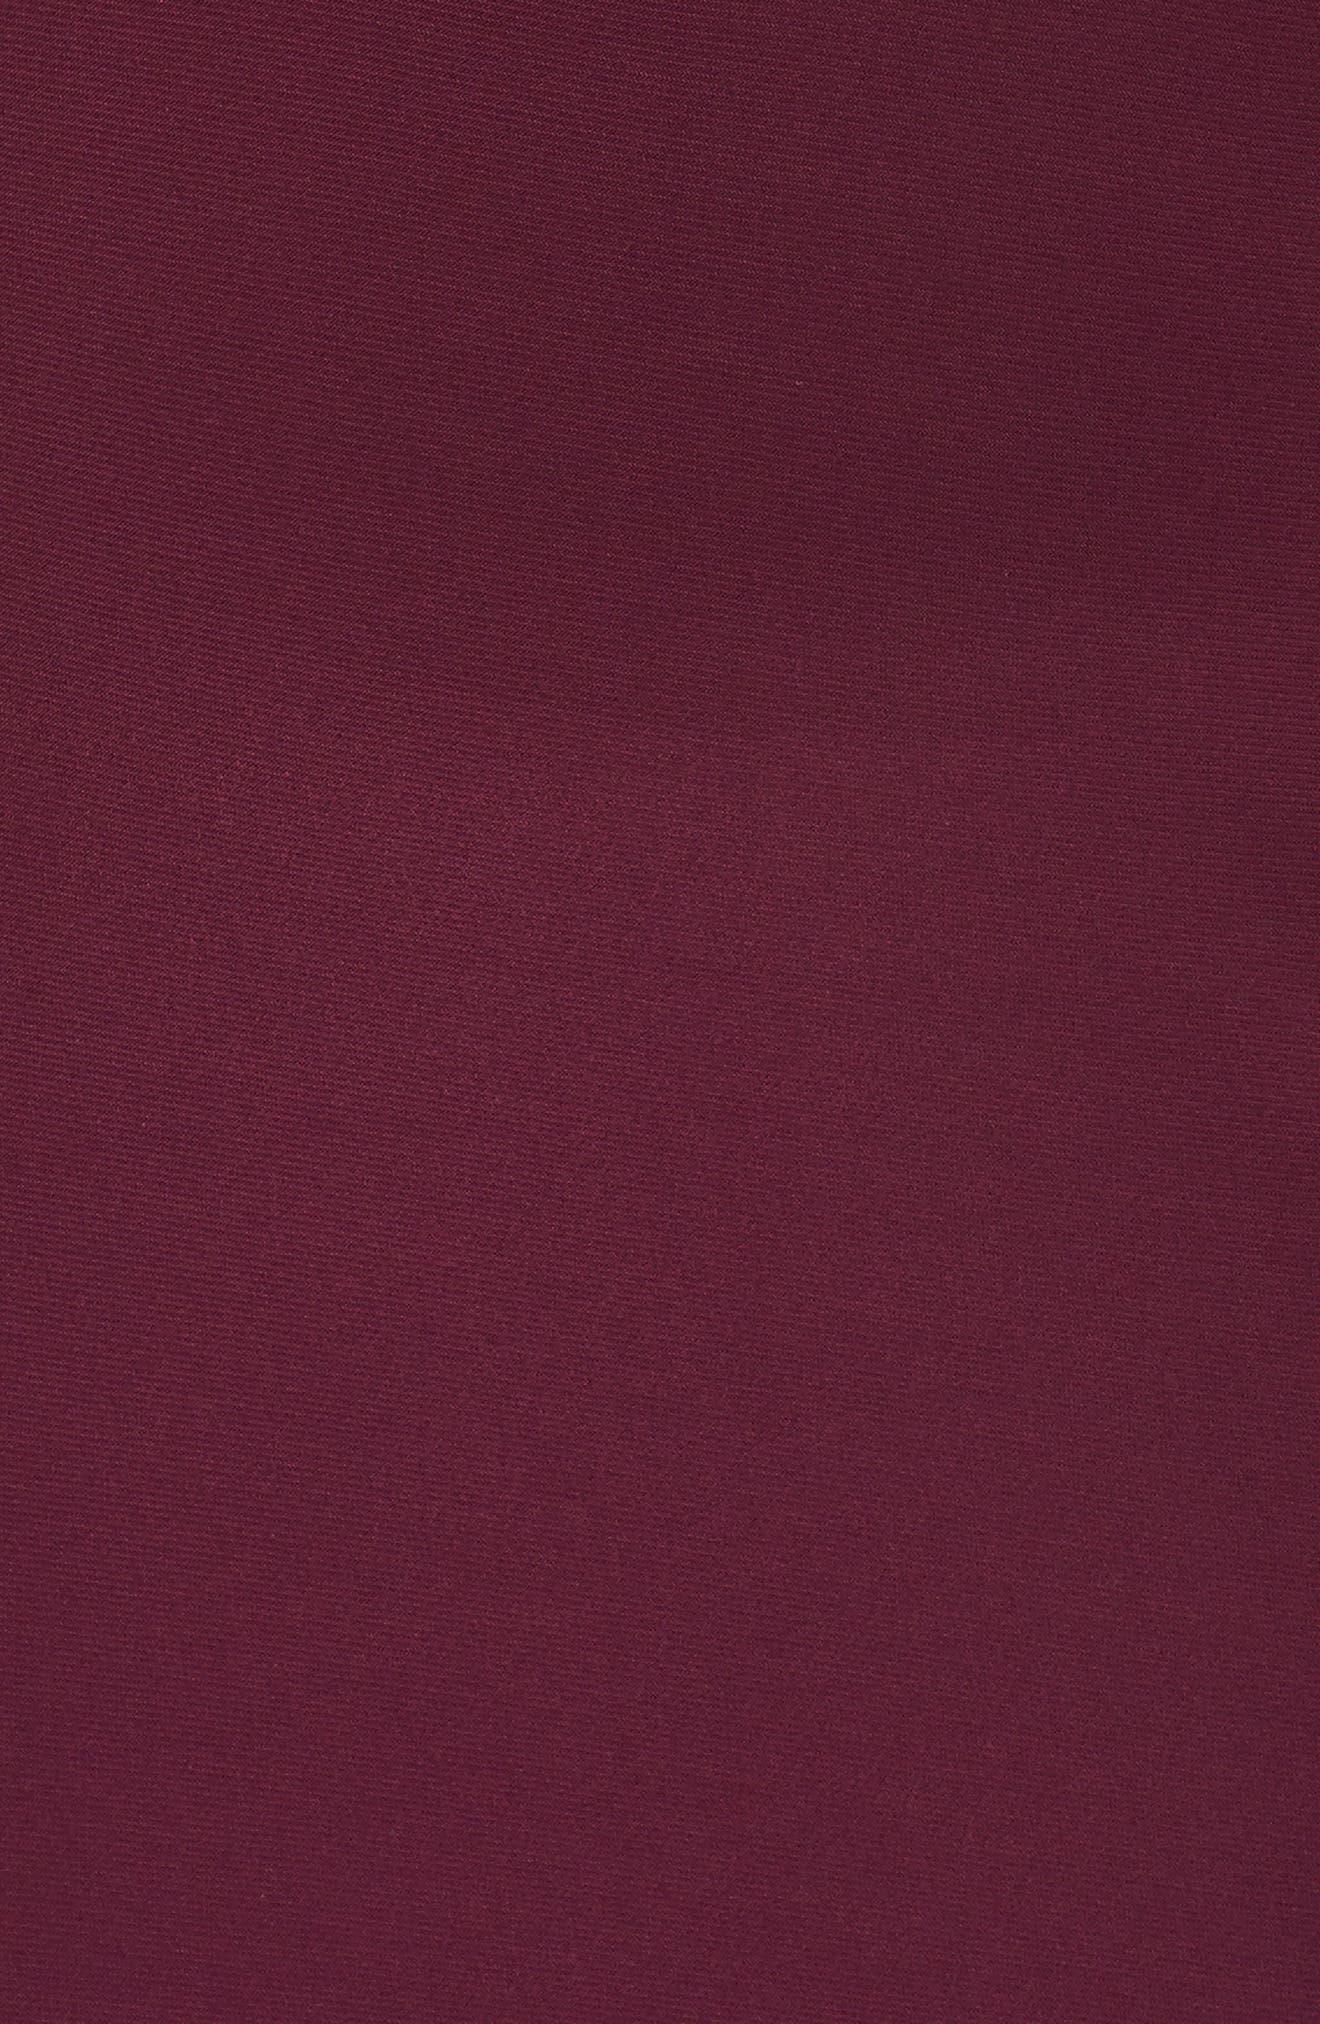 Lace Bodice Dress,                             Alternate thumbnail 5, color,                             Merlot/ Nude